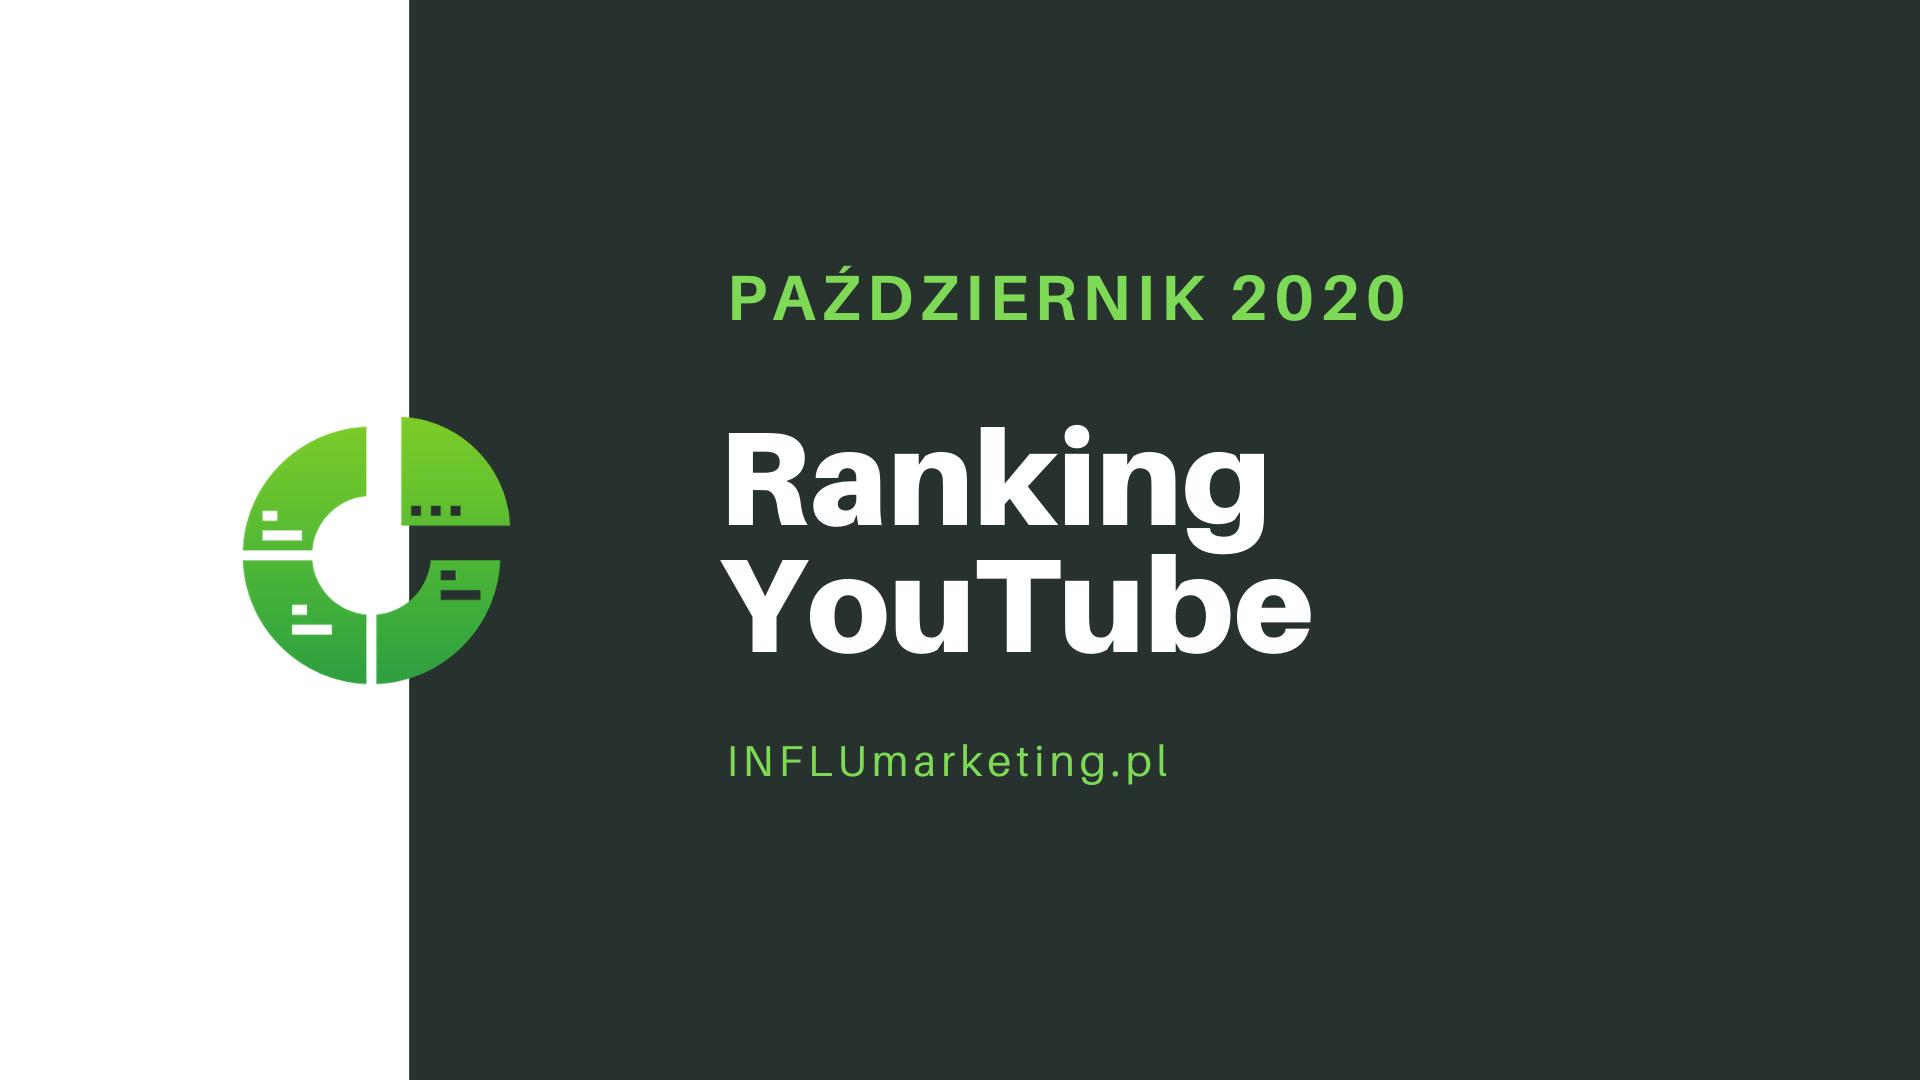 RANKING TOP 10 YOUTUBE Polska październik 2020 cover photo